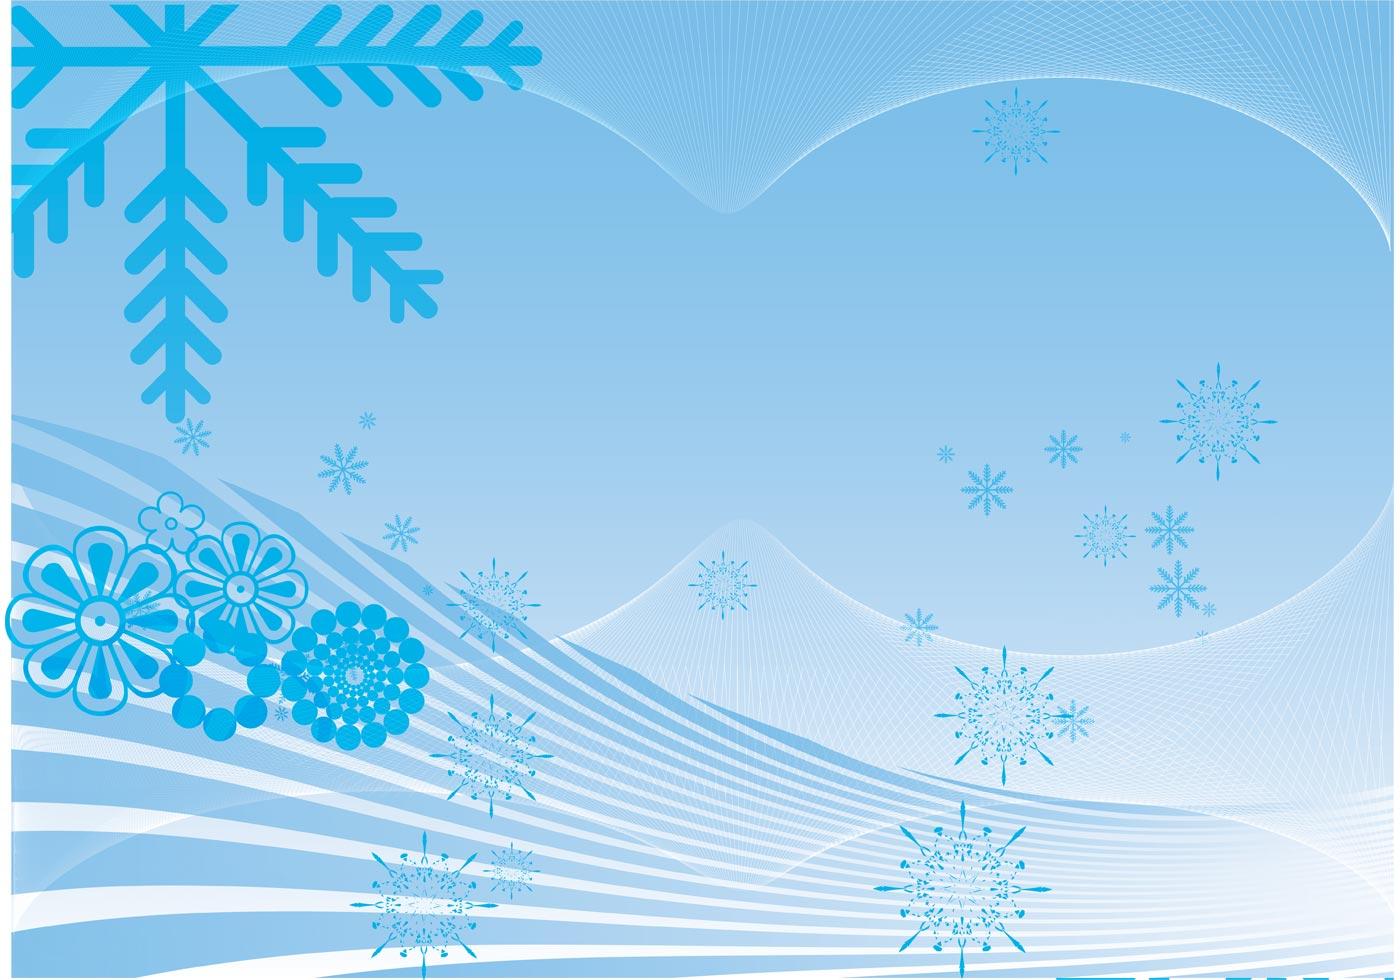 winter snow vector download free vector art stock. Black Bedroom Furniture Sets. Home Design Ideas